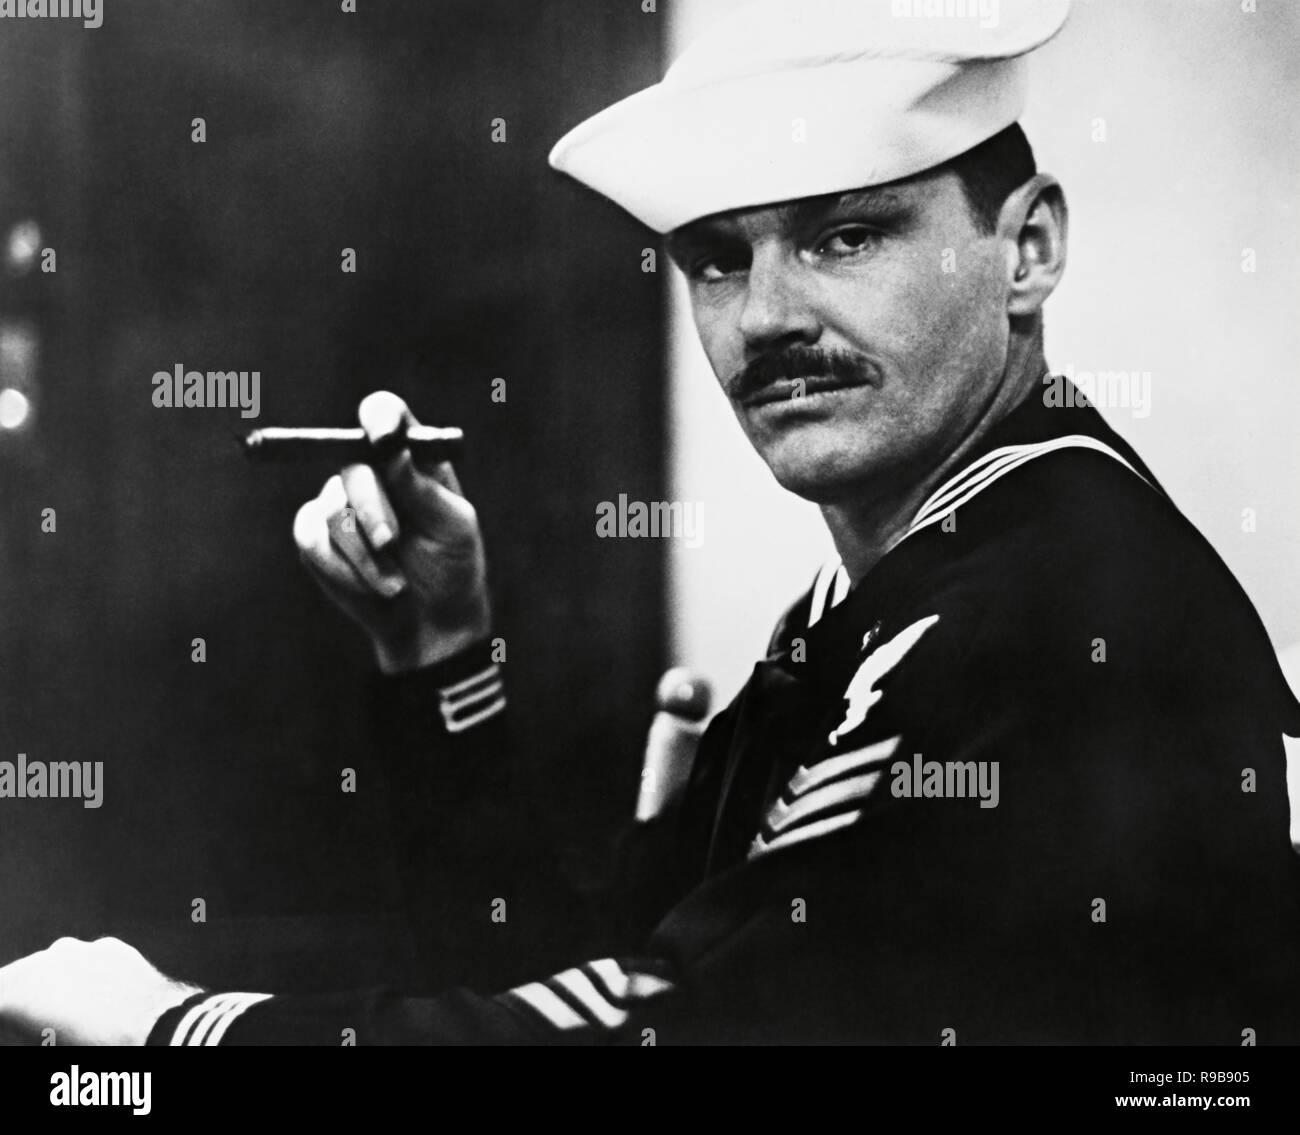 Original film title: THE LAST DETAIL. English title: THE LAST DETAIL. Year: 1973. Director: HAL ASHBY. Stars: JACK NICHOLSON. Credit: COLUMBIA PICTURES / Album - Stock Image